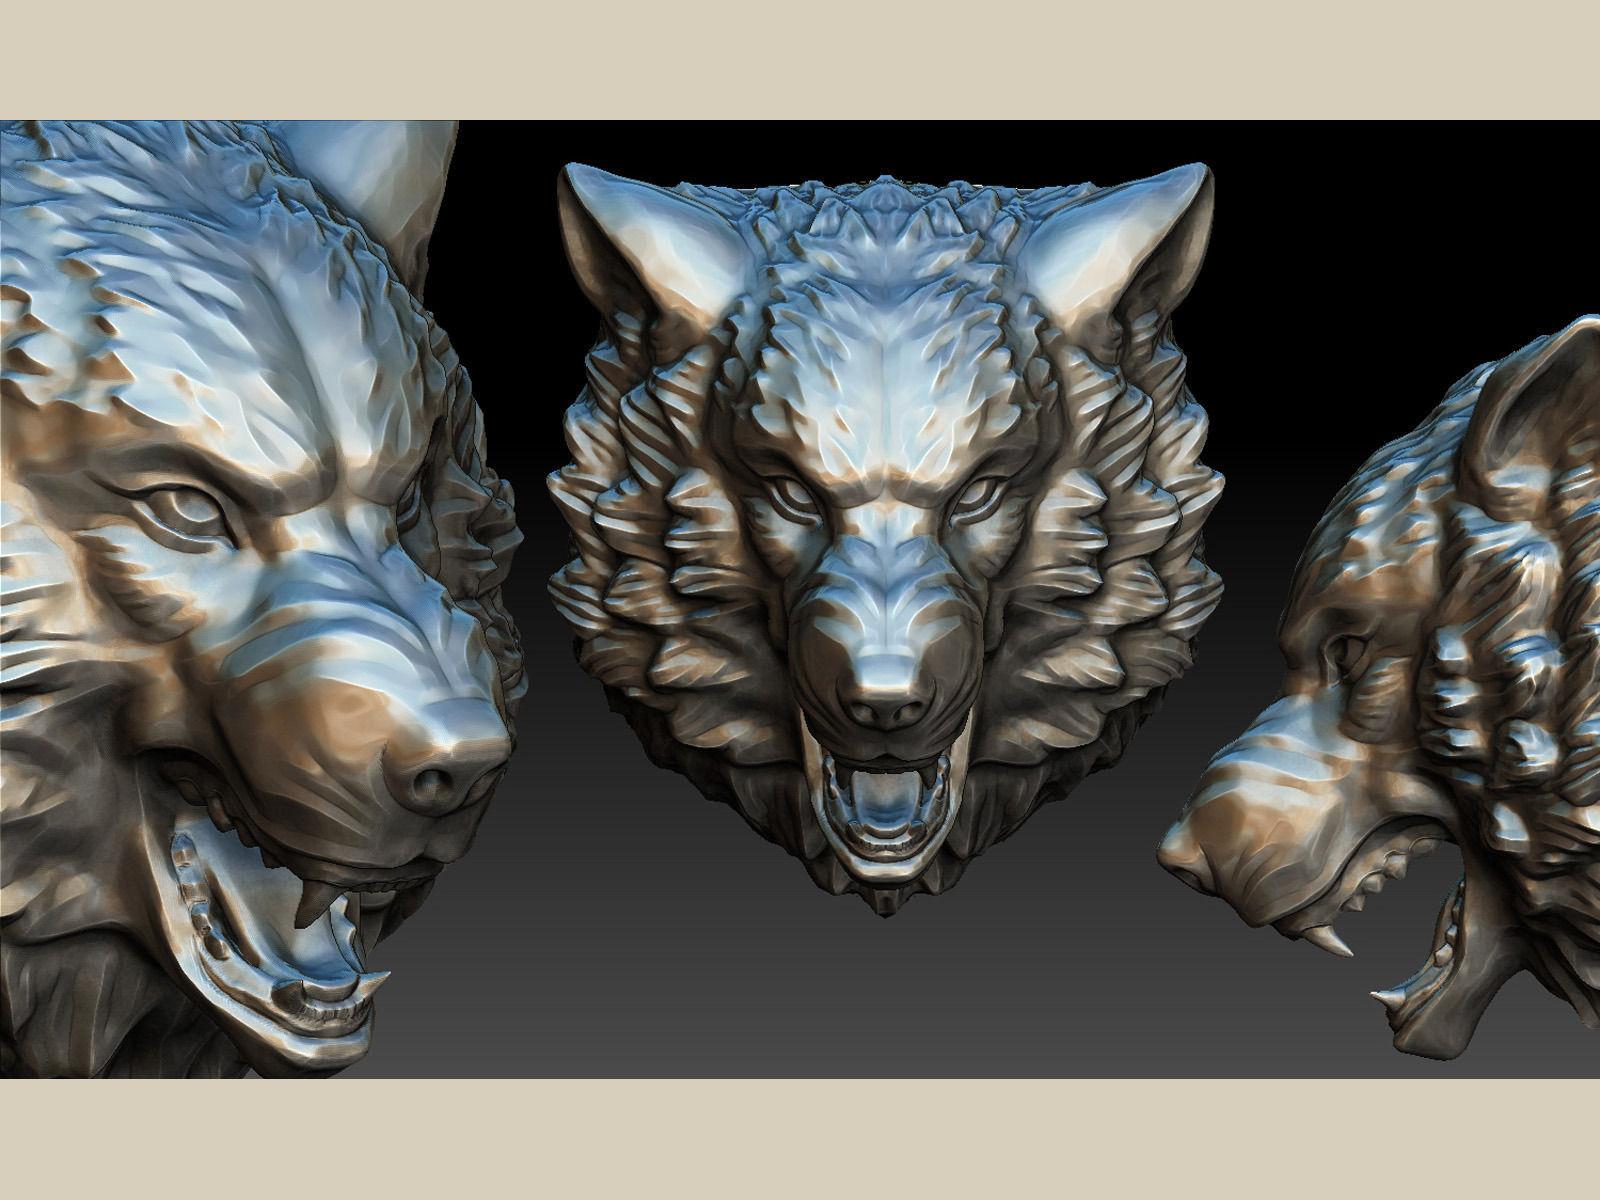 Stylized Wolf Head 0190 3d Model 3d Printable Obj Fbx Ma